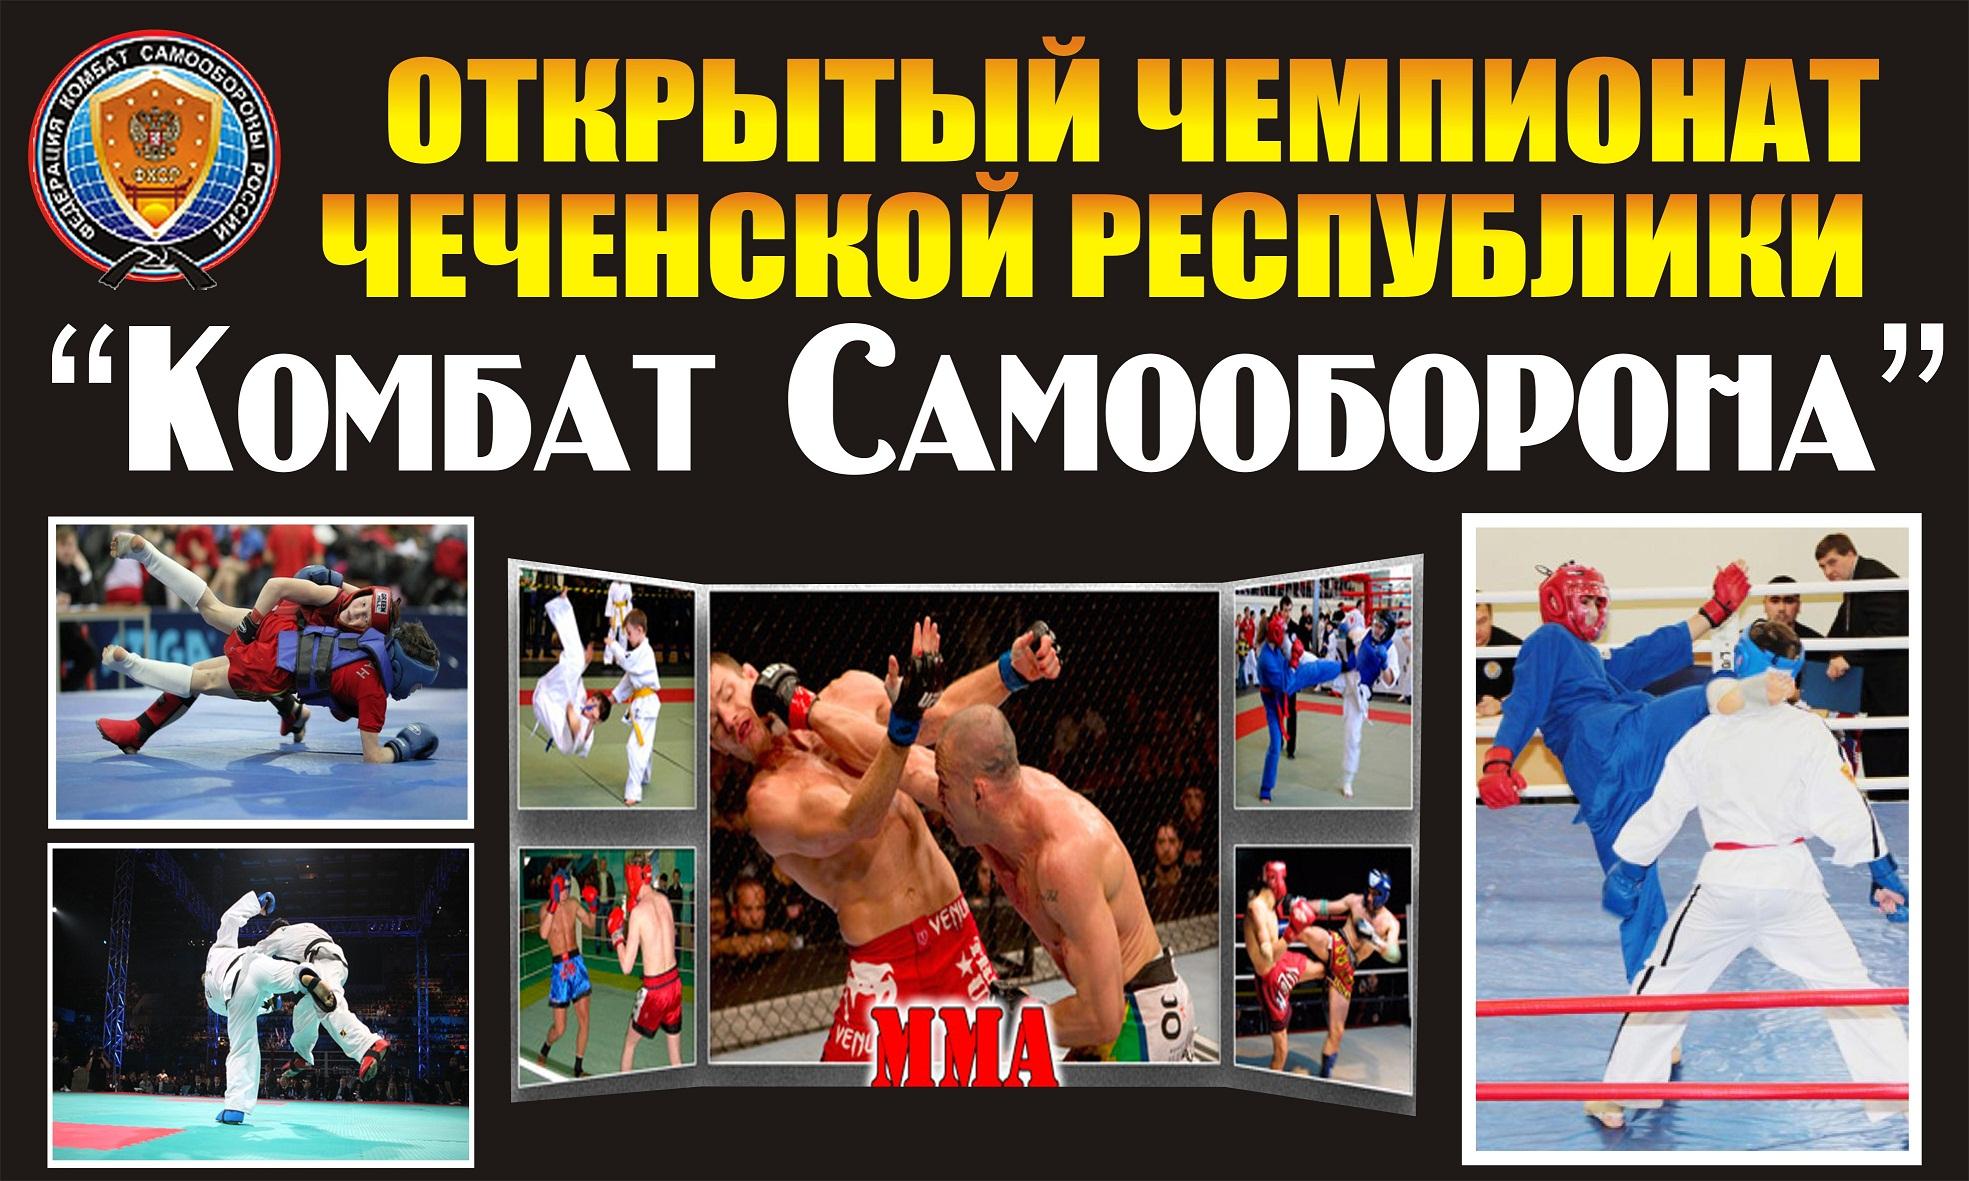 http://www.combatsd.ru/images/upload/Афиша-Грозный.jpg